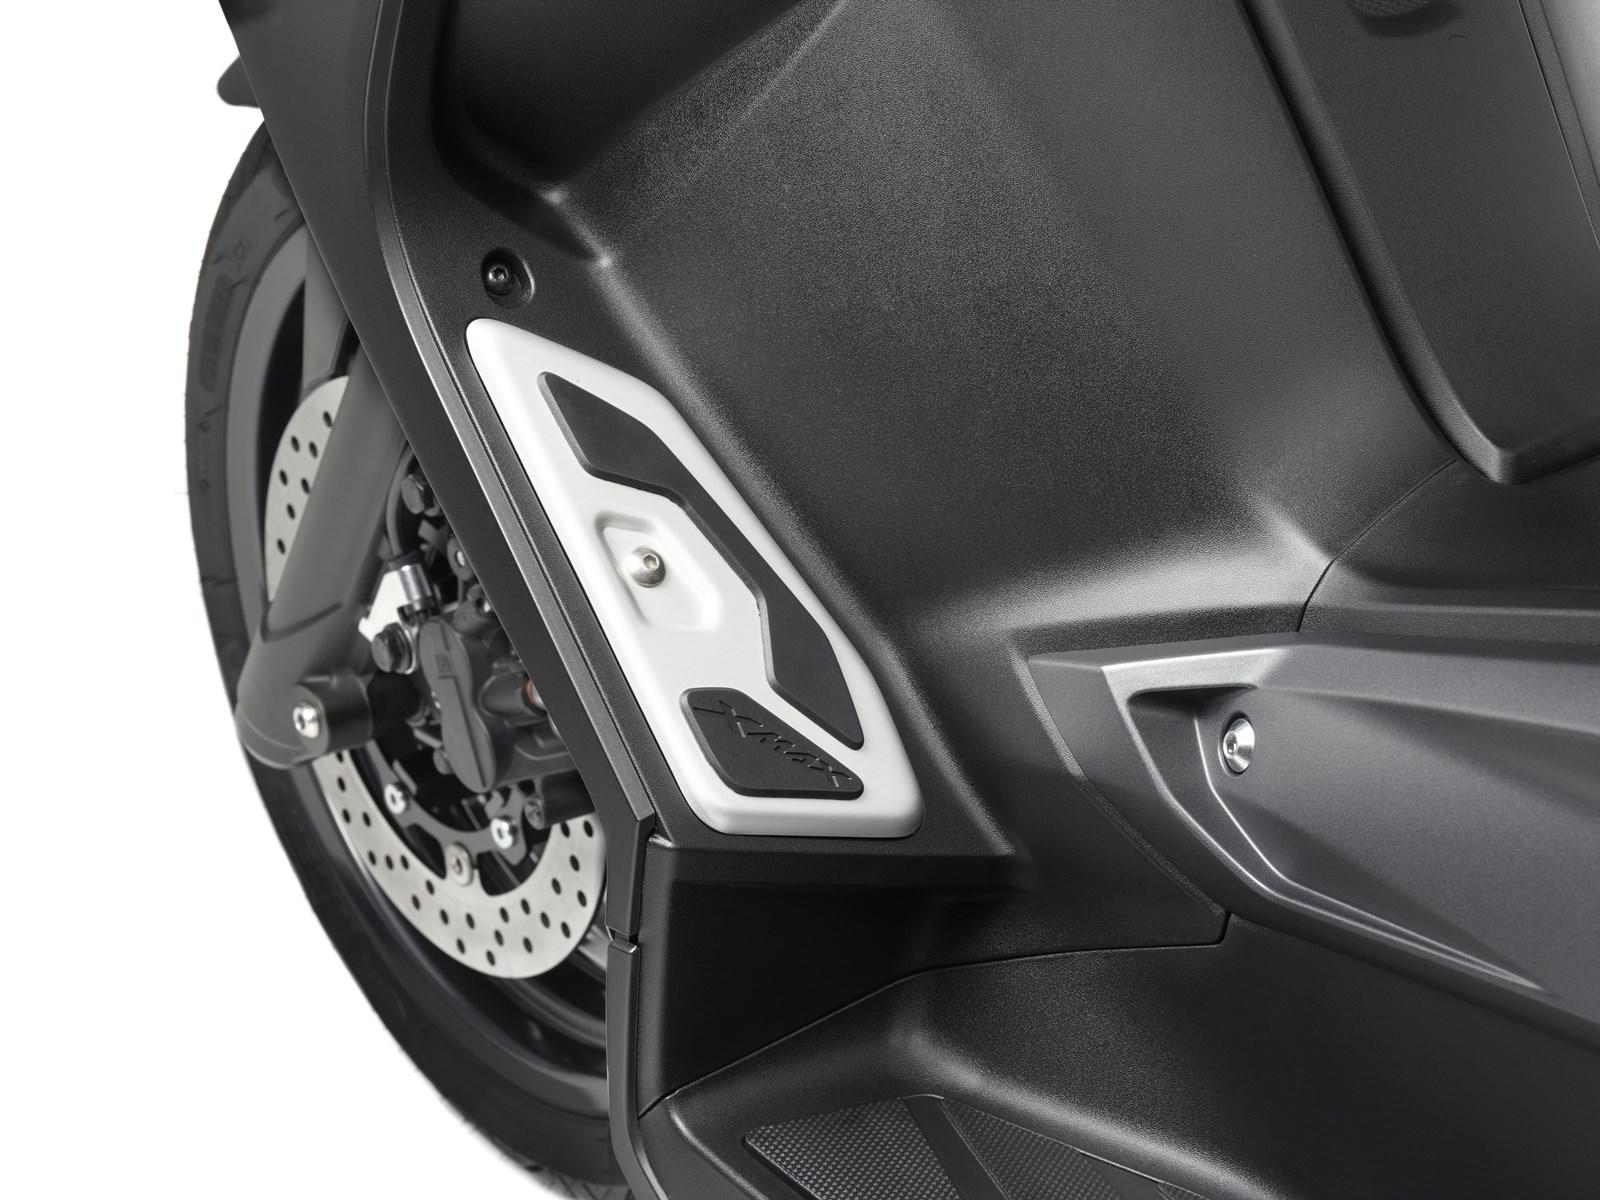 Foto de Yamaha X-MAX 400 MOMODESIGN, estudio y detalles (29/33)